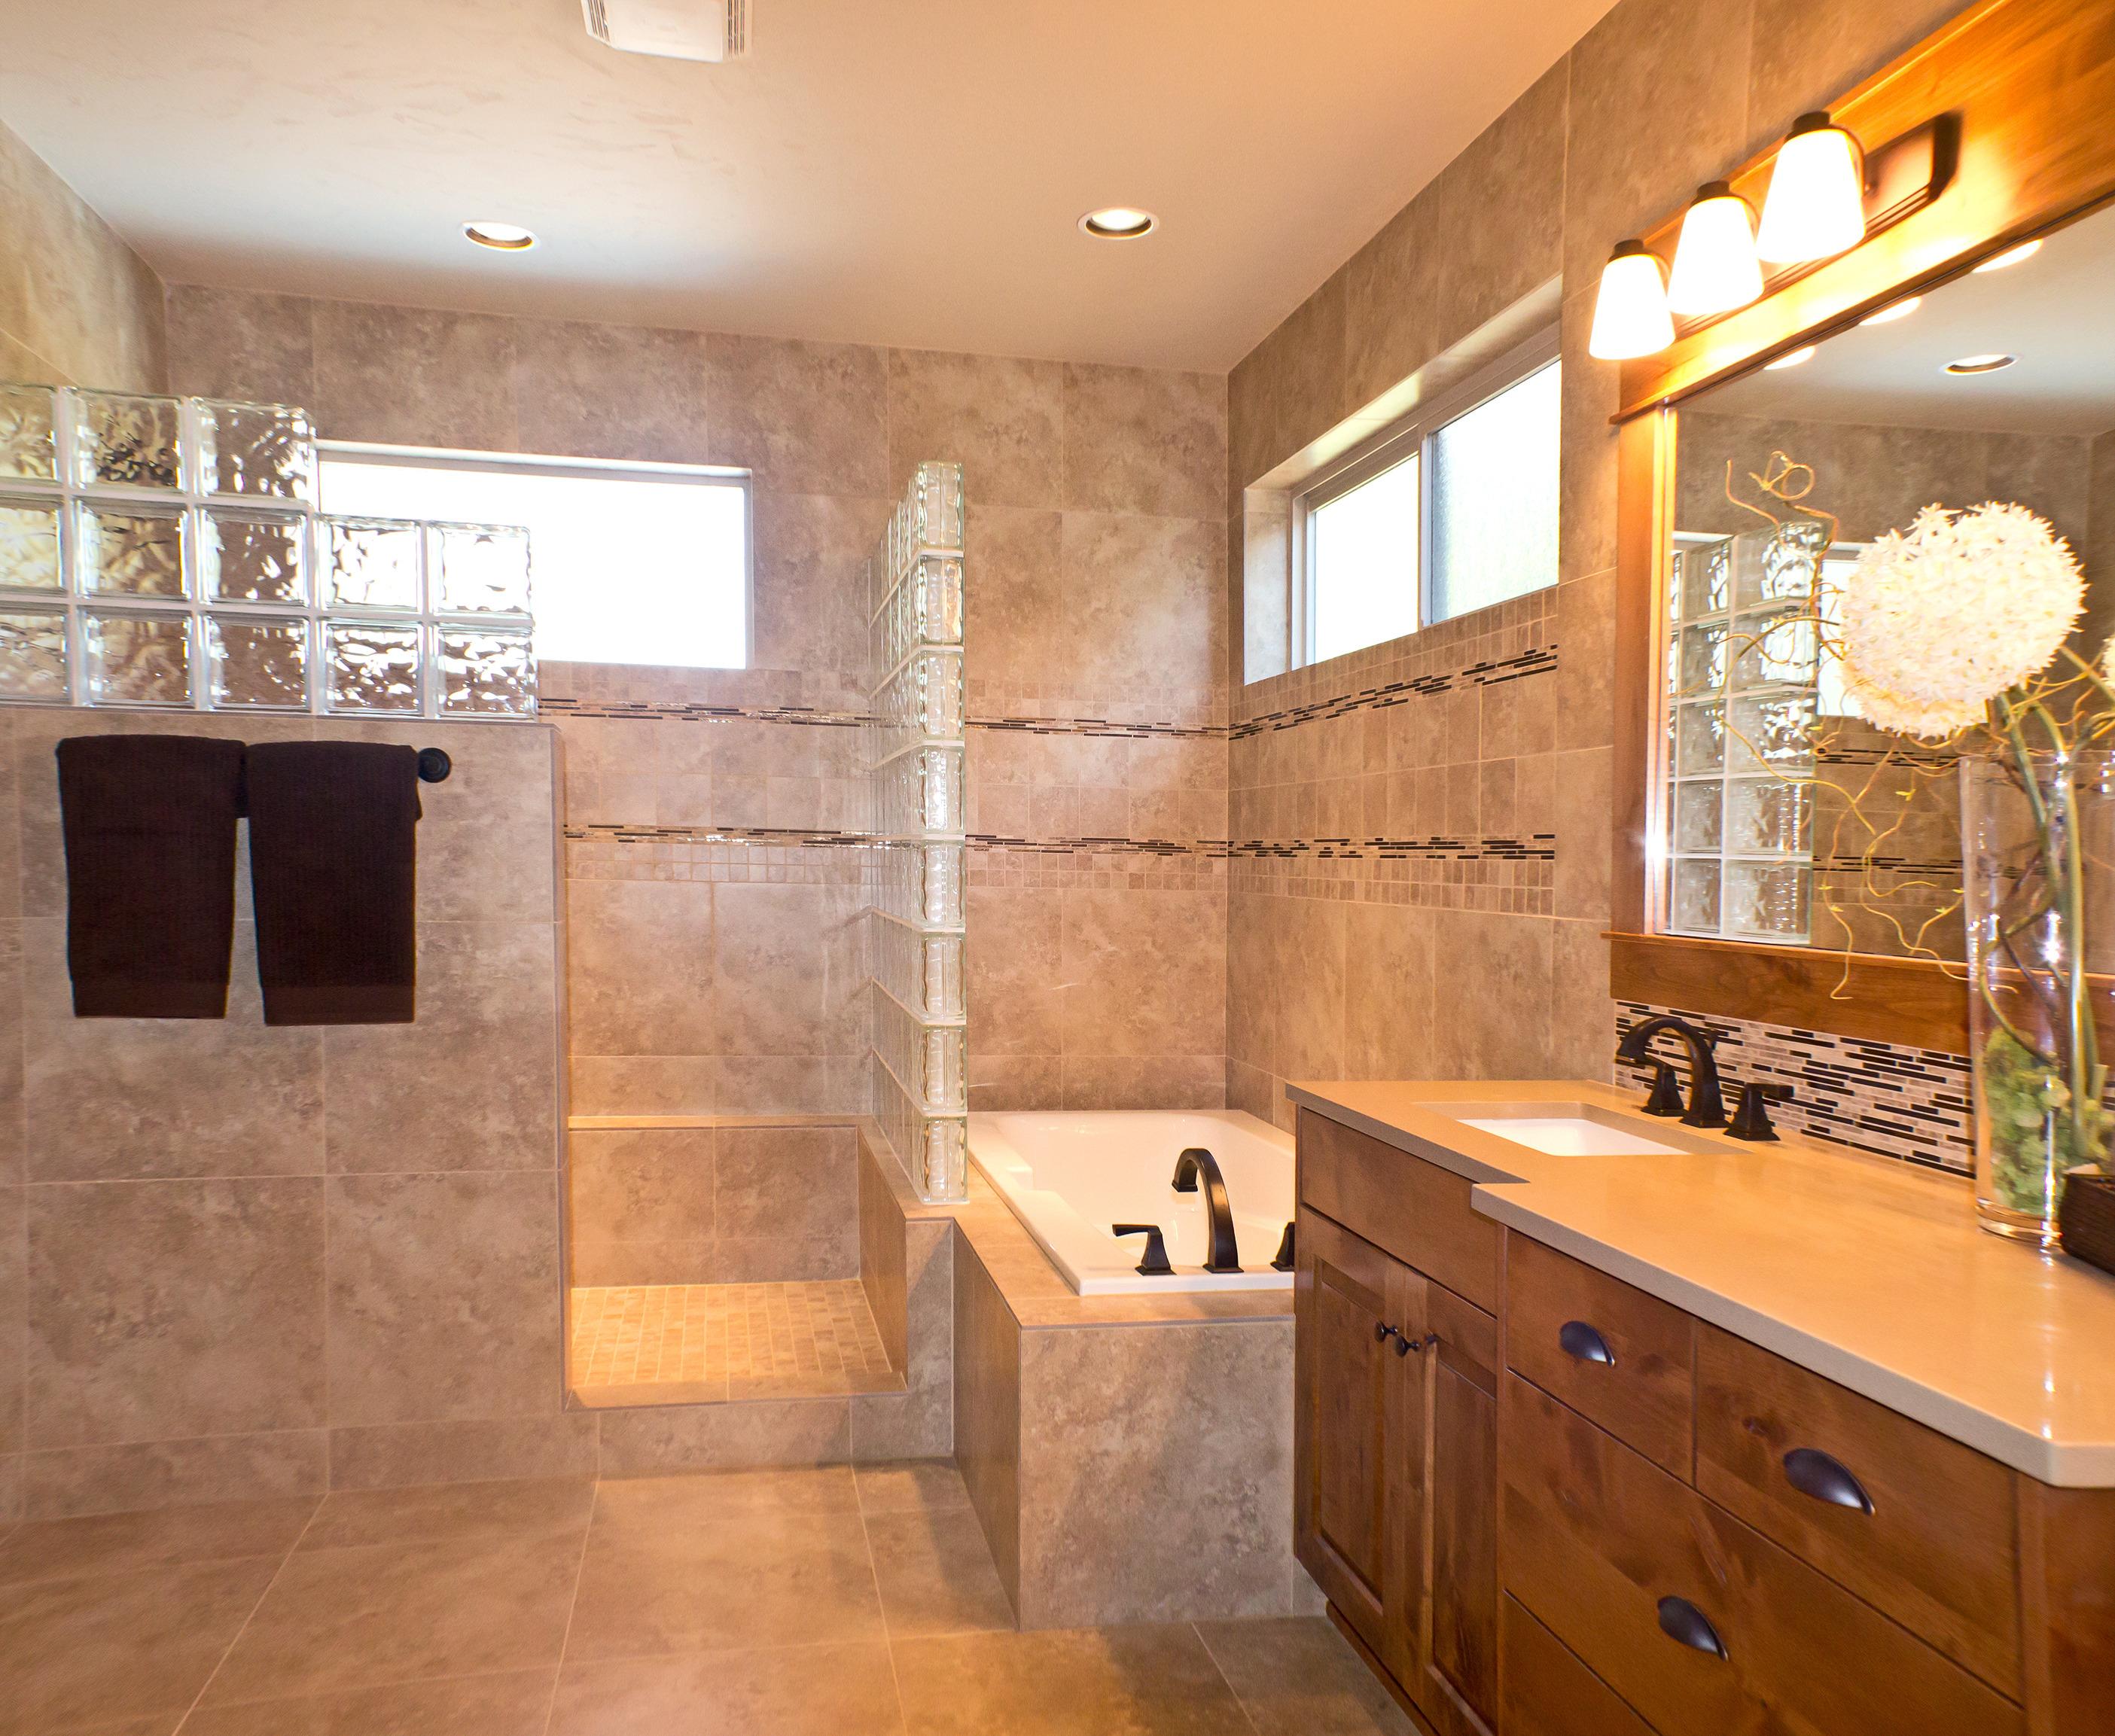 Home Improvement Project Bathroom Renovation LPU Homes - Home improvement bathroom remodel